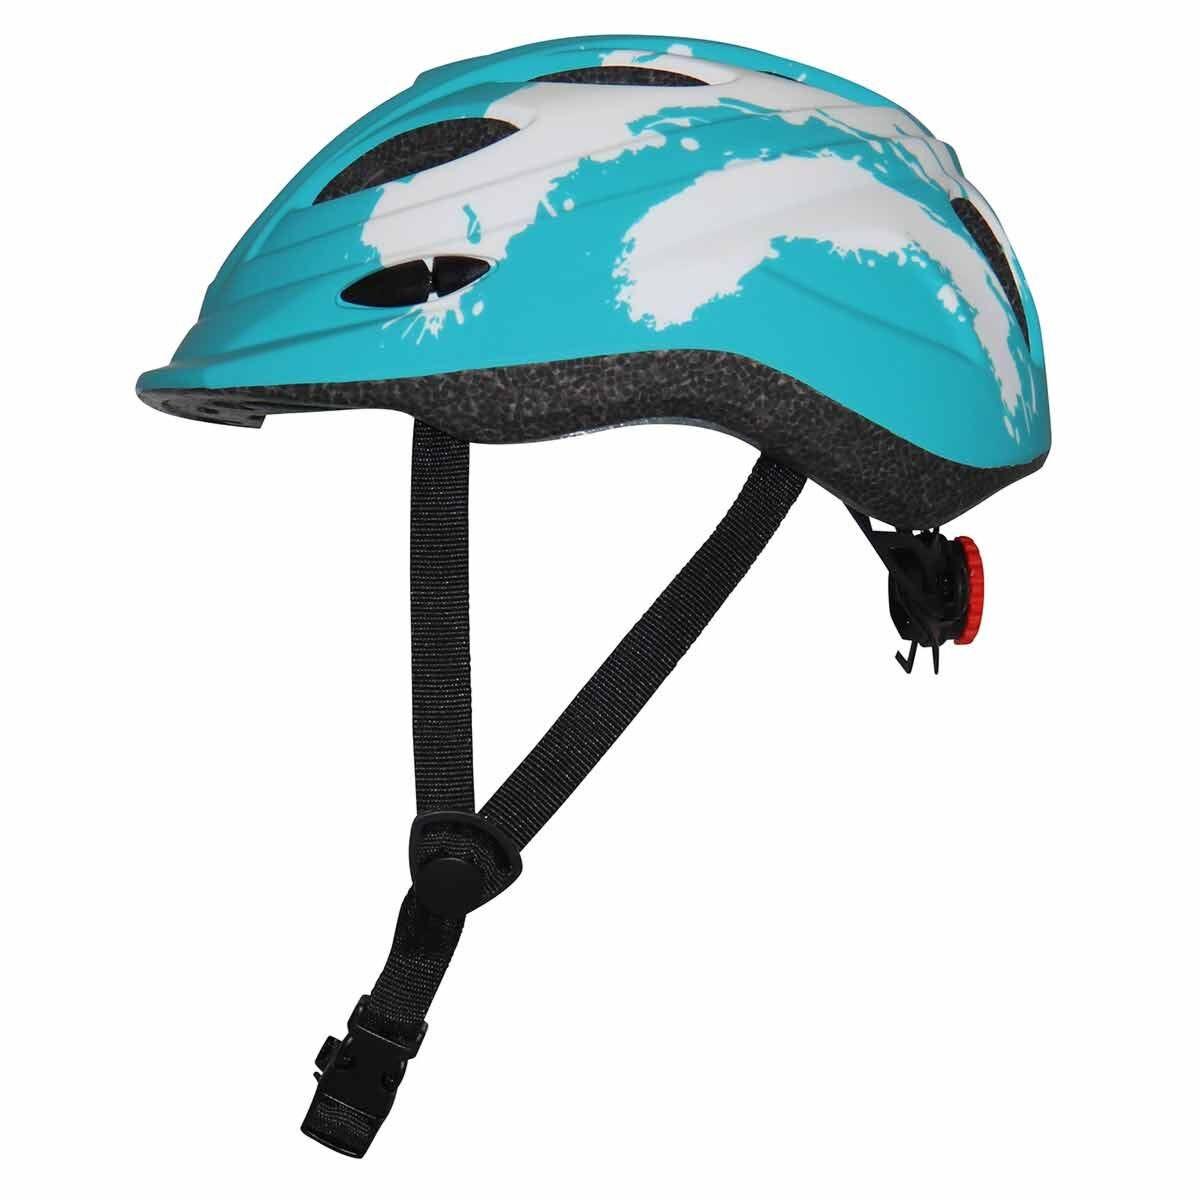 One23 Childs Bicycle Helmet 46-52cm